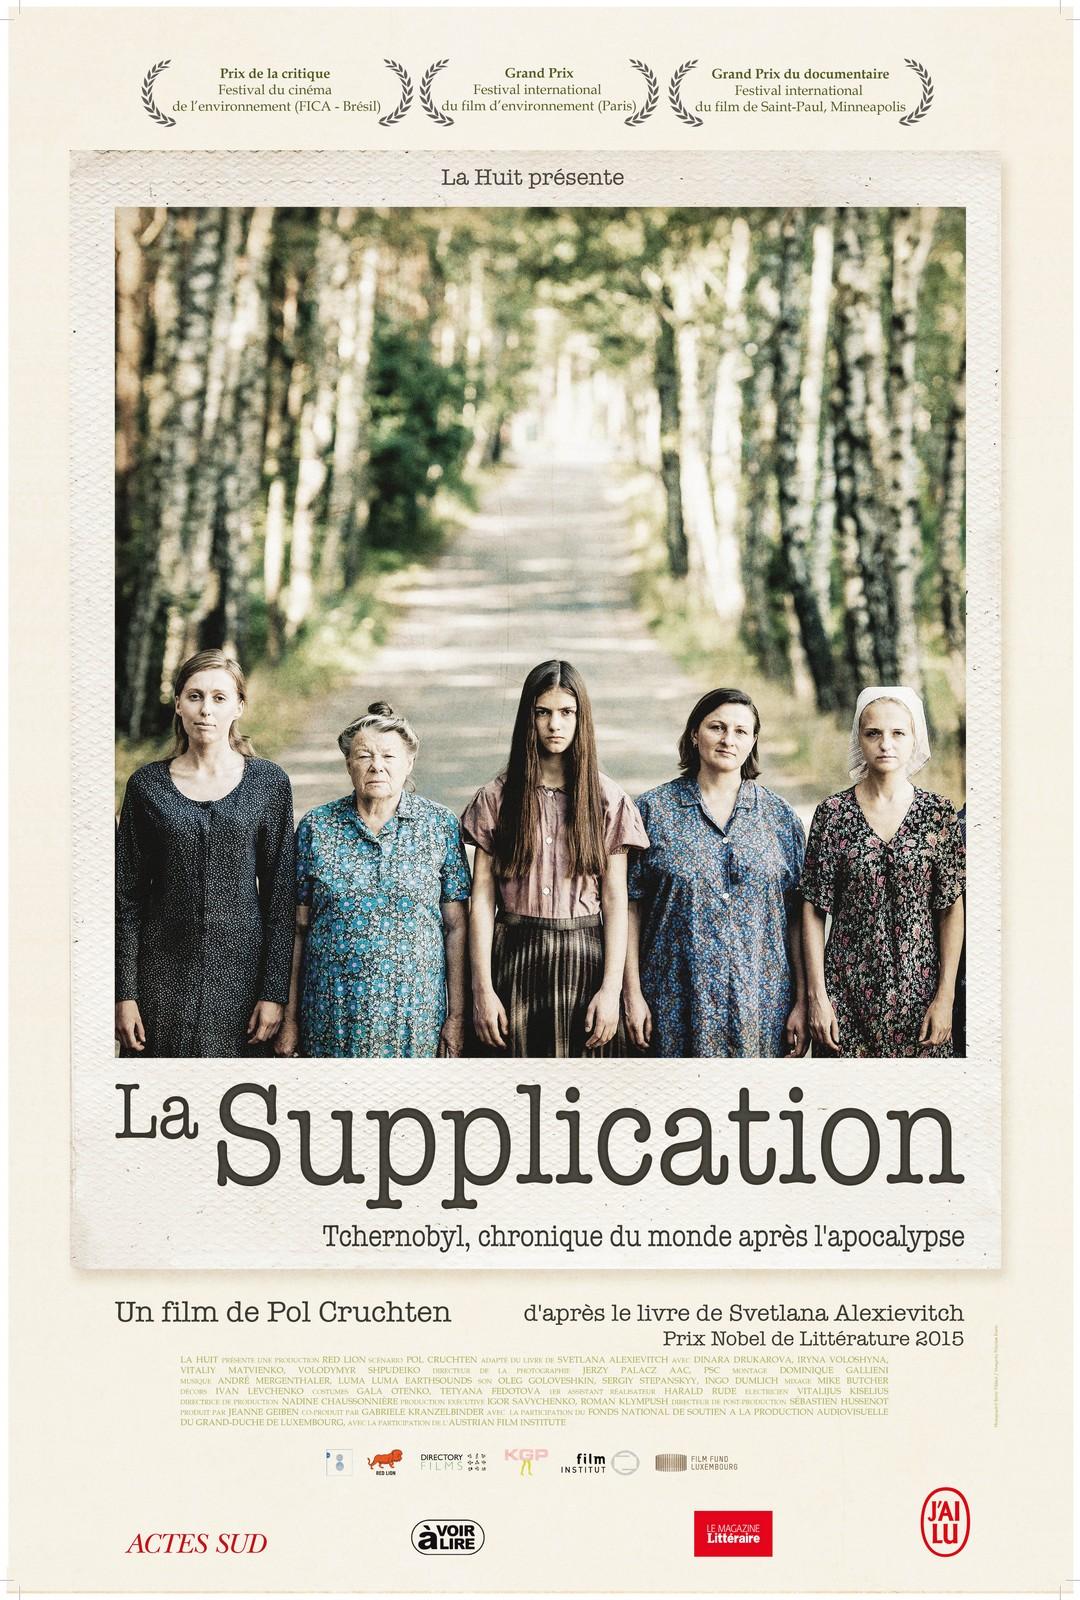 La Supplication